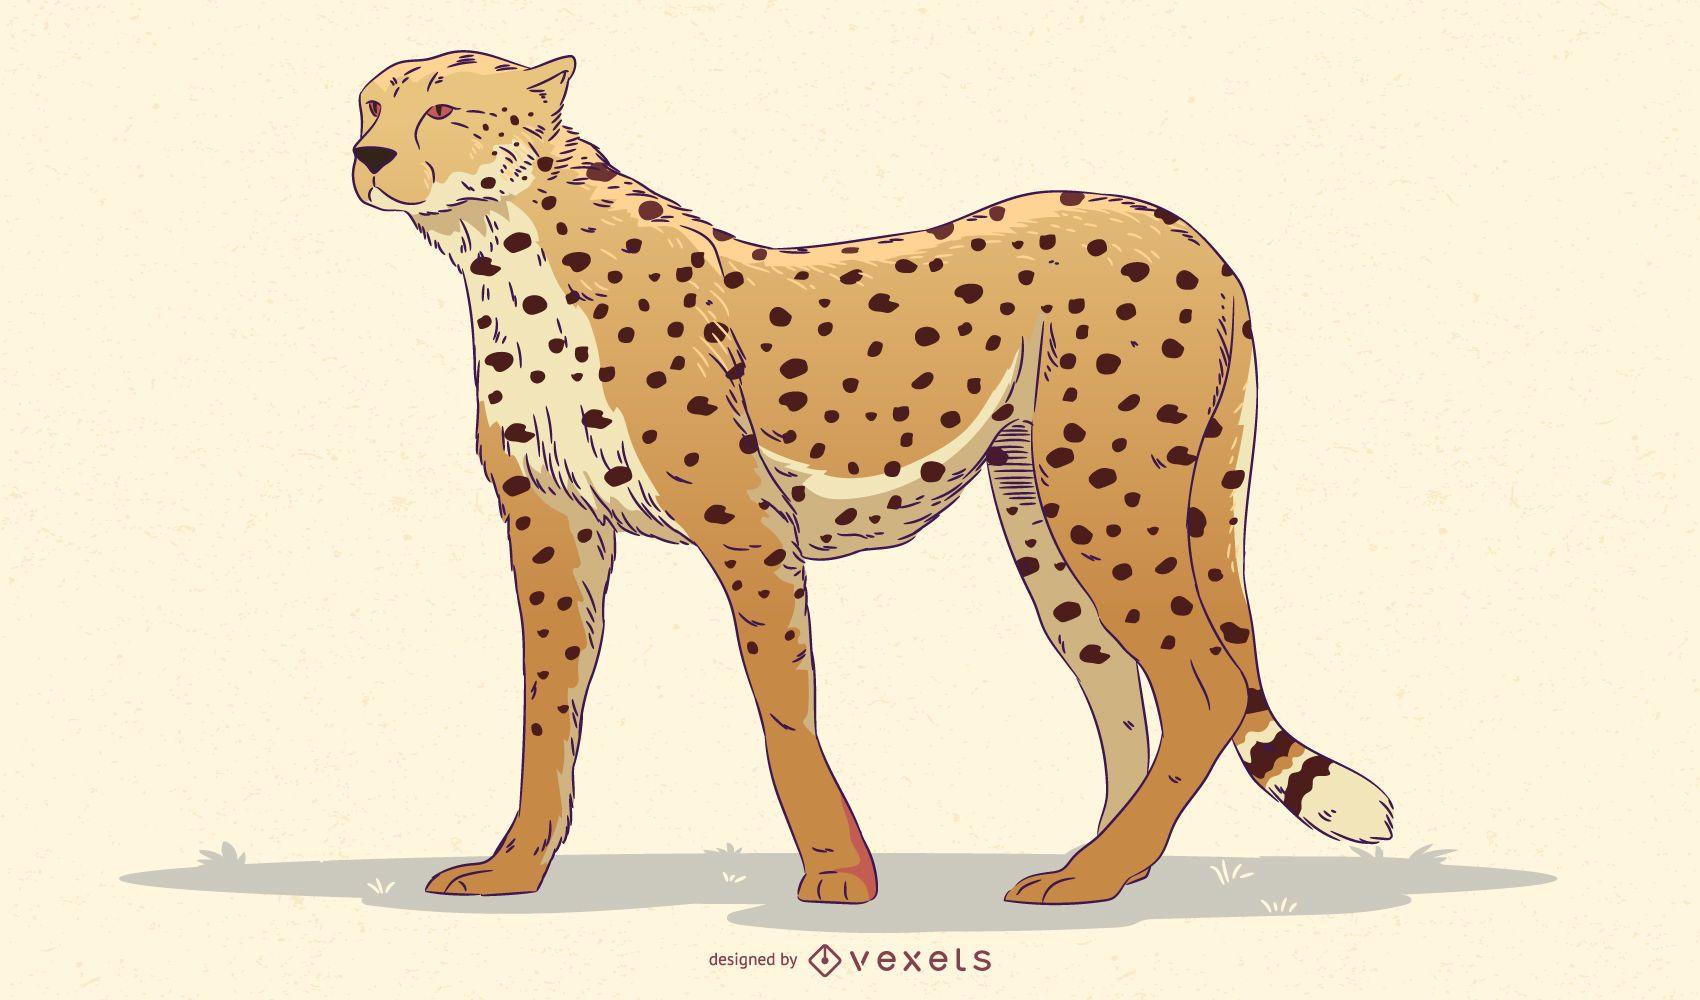 Cheetah illustration design